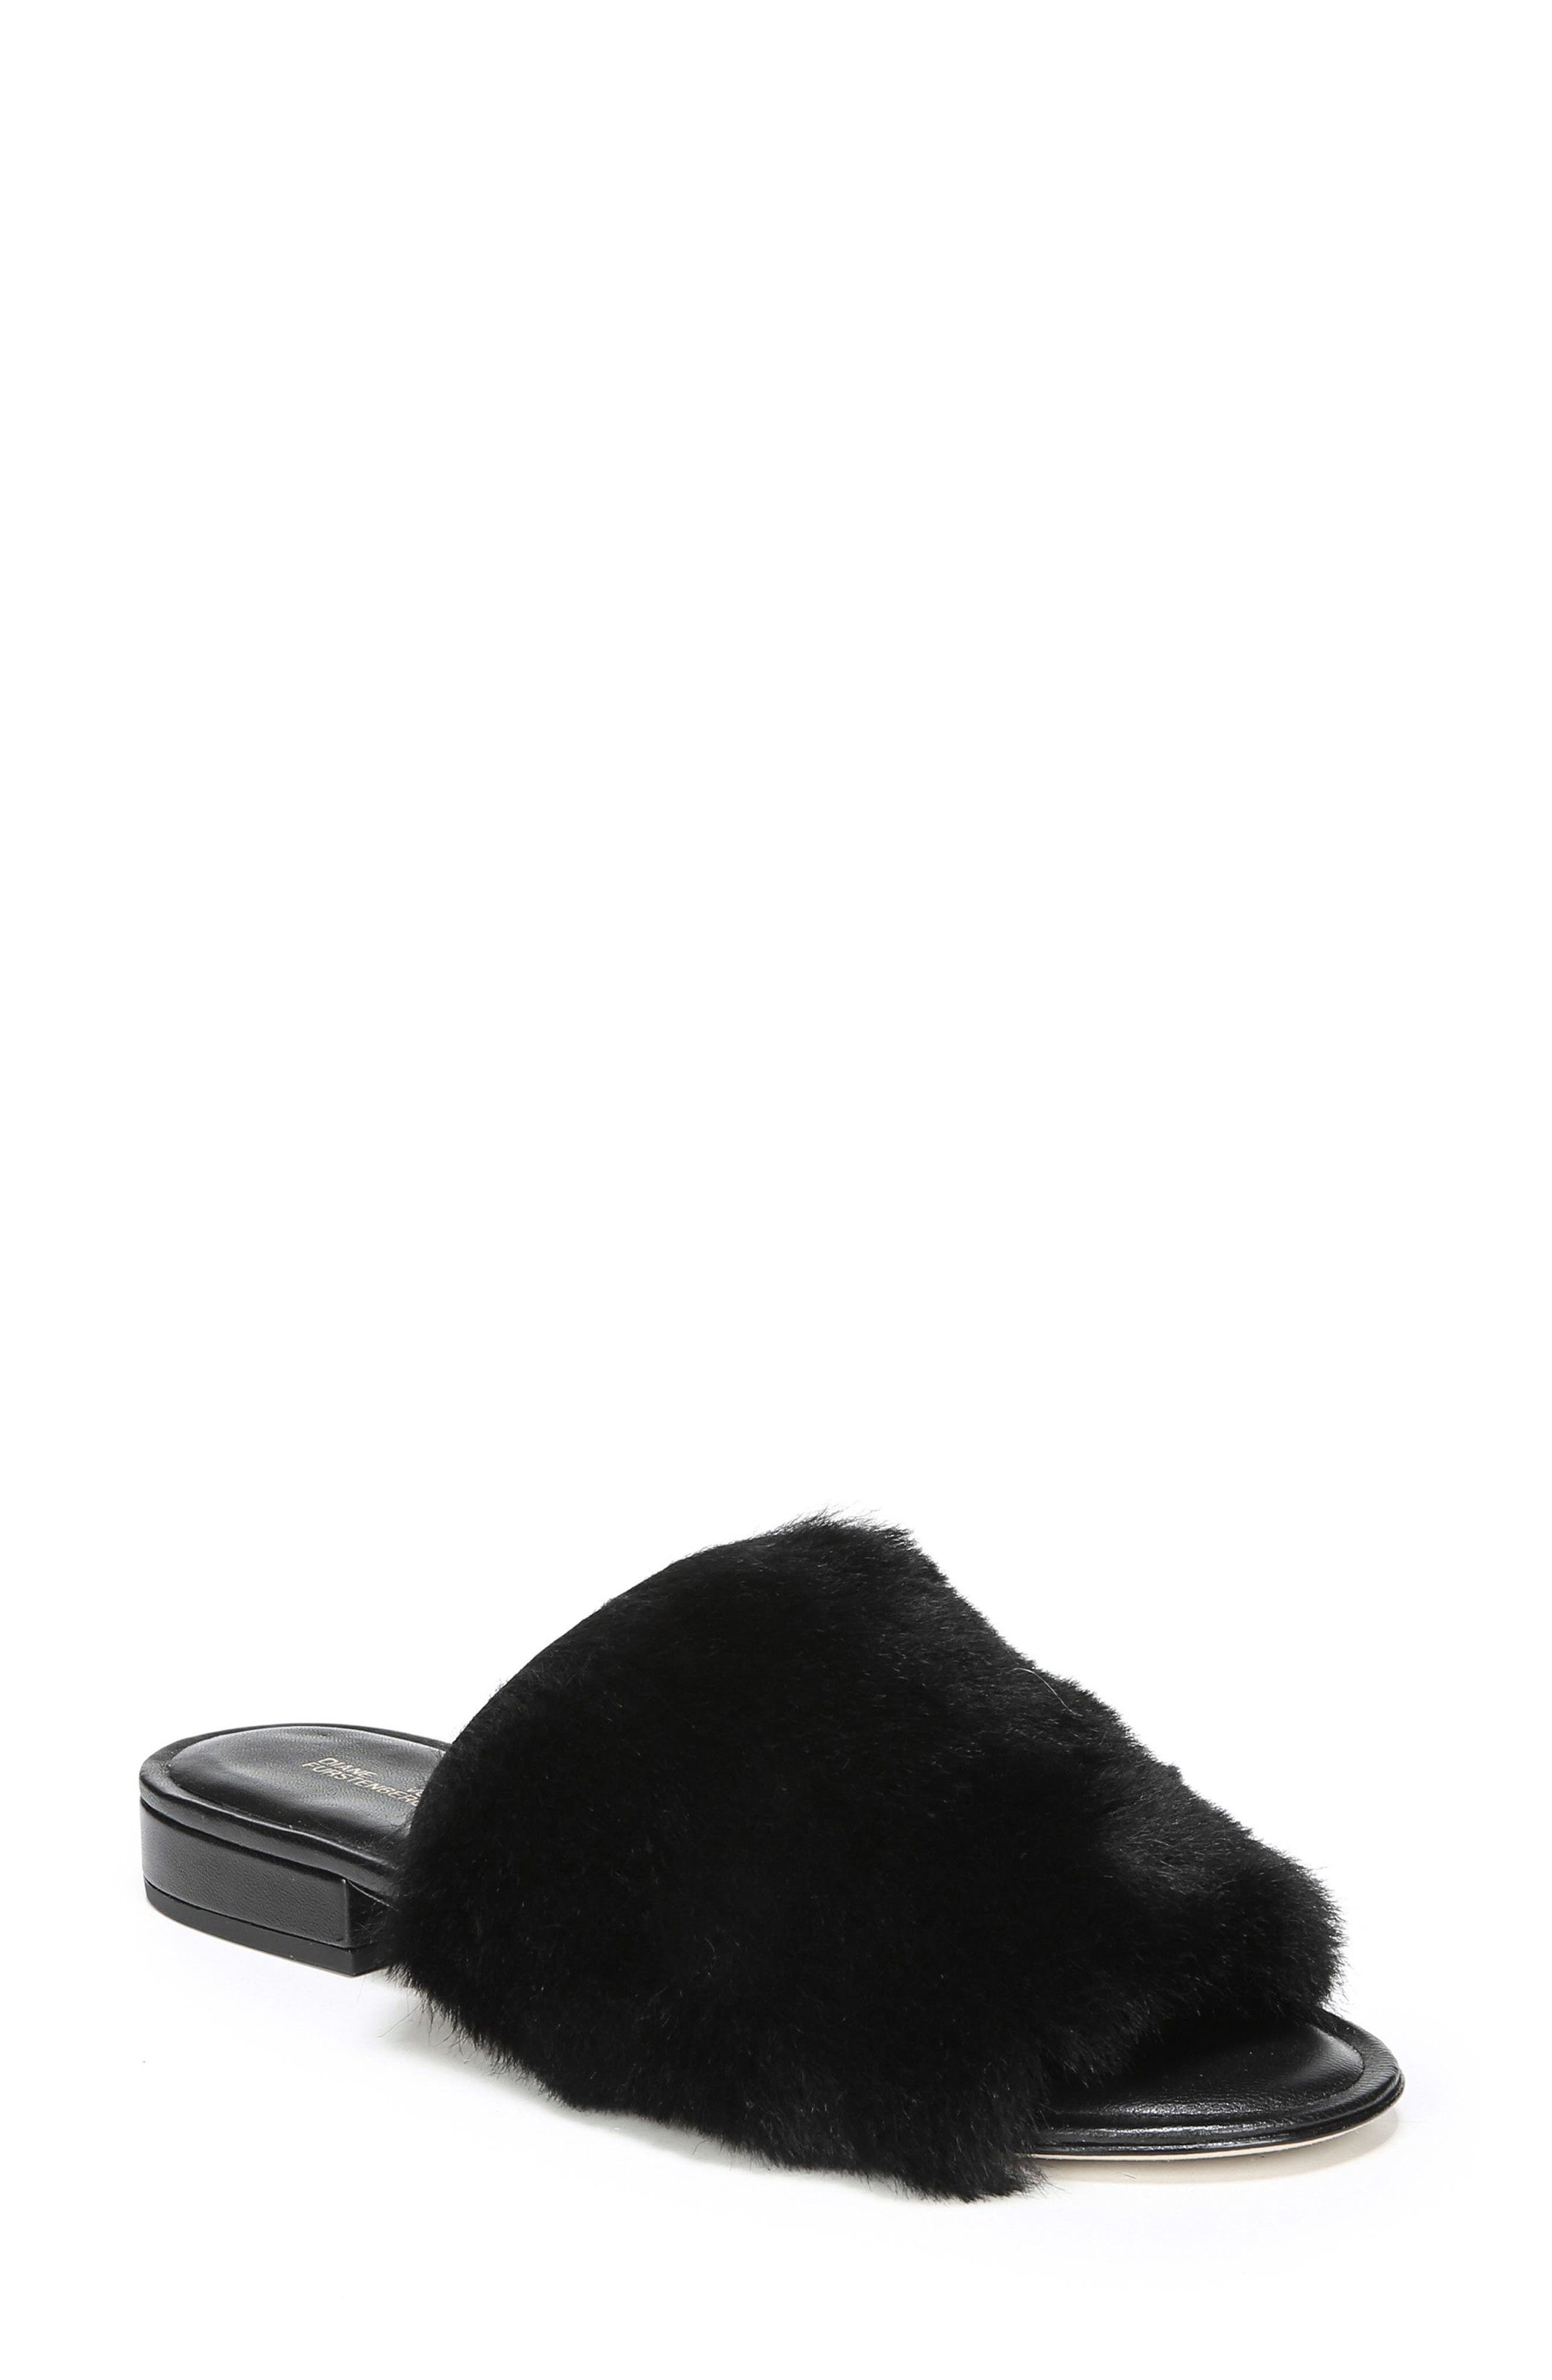 Santi Genuine Shearling Slide Sandal,                         Main,                         color, Black